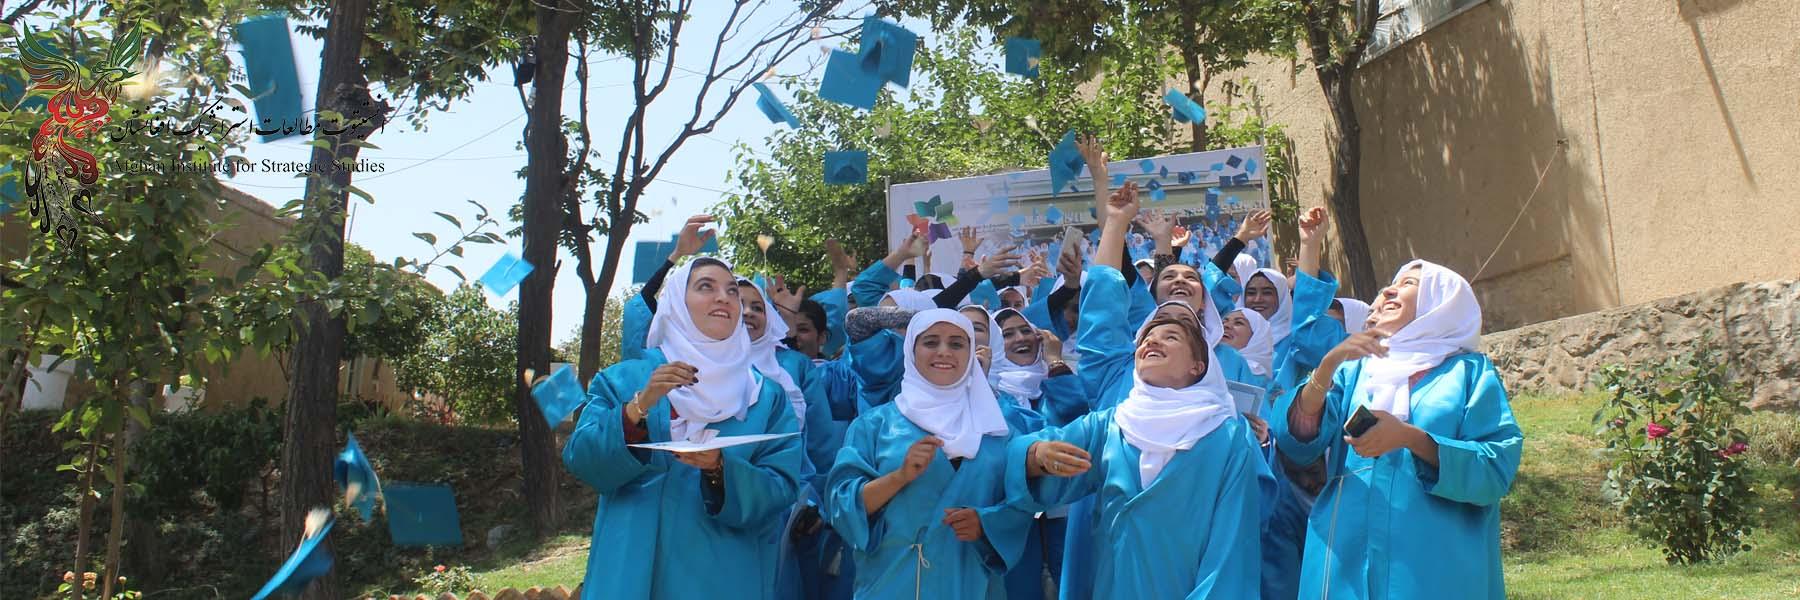 Afghan Institute for Strategic Studies hosts the AAE Students' Graduation